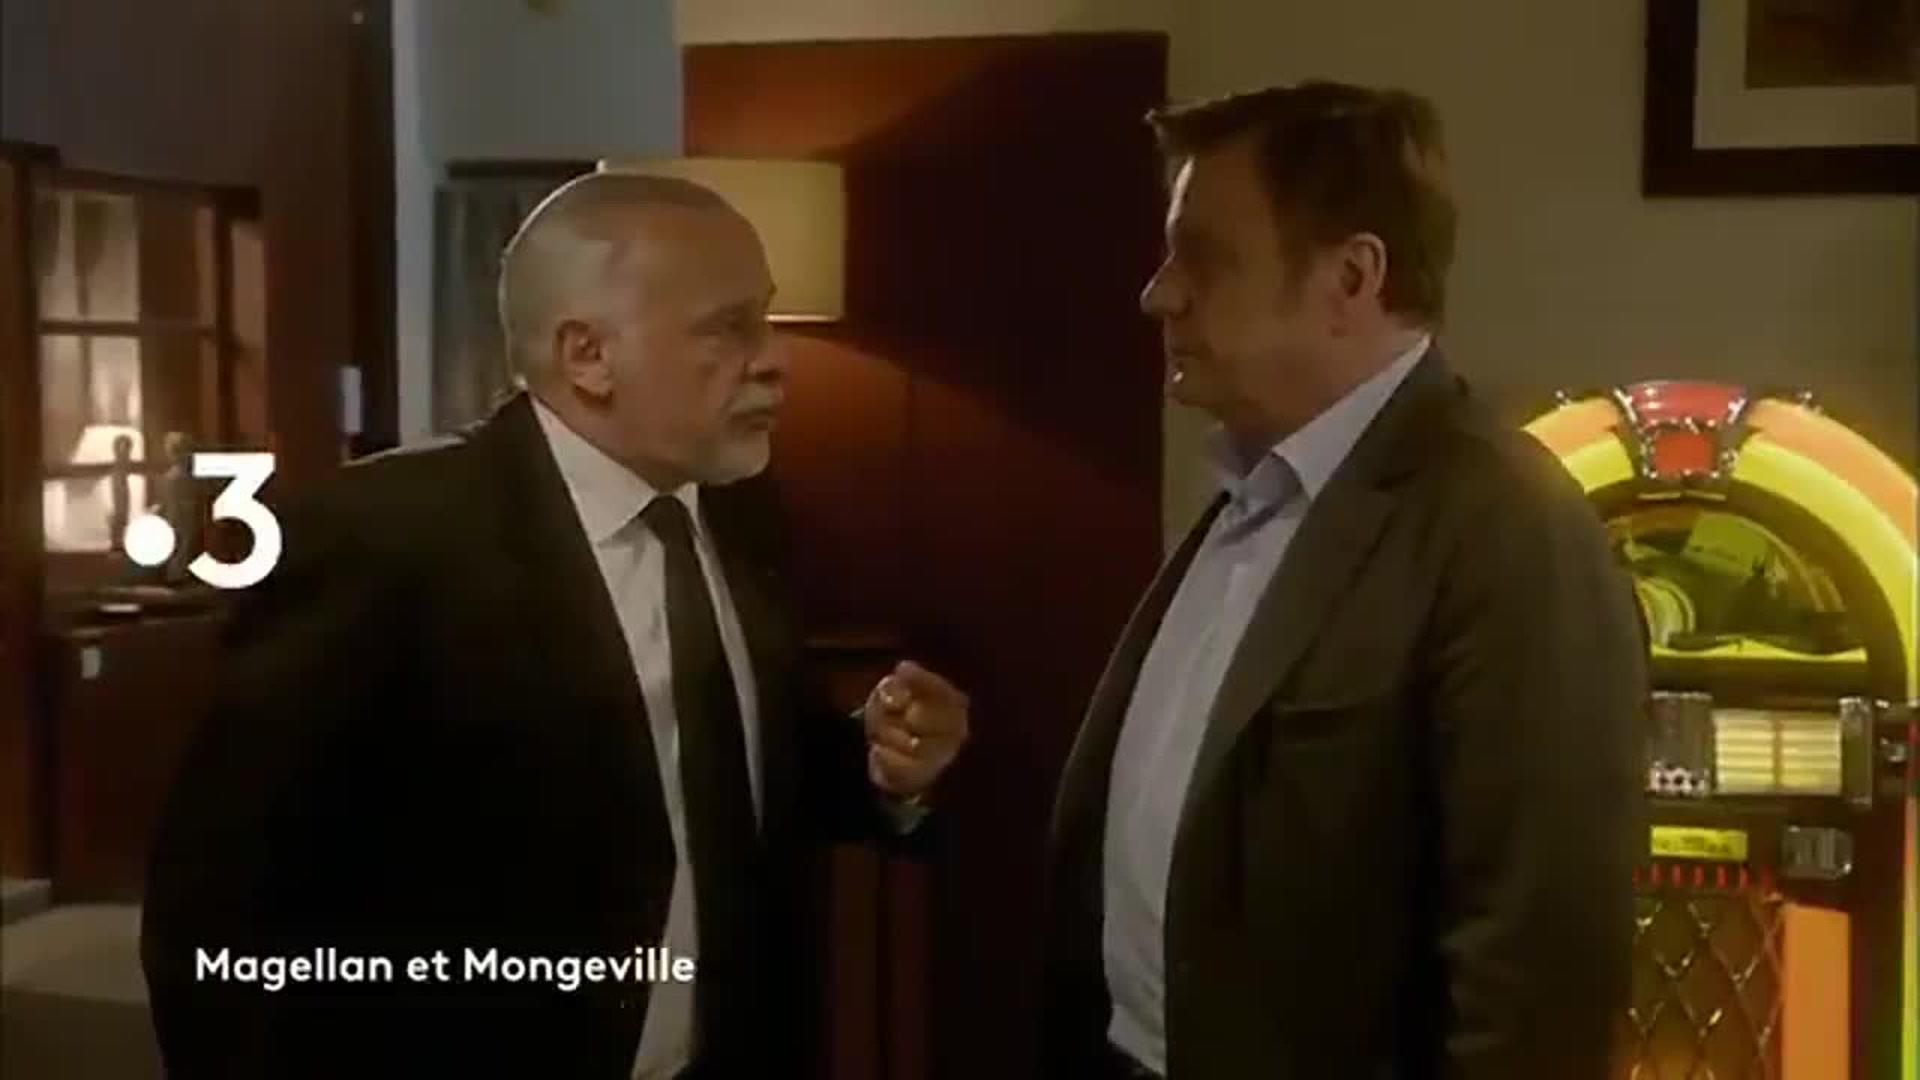 Commissaire Magellan : Magellan et Mongeville : Folle jeunesse